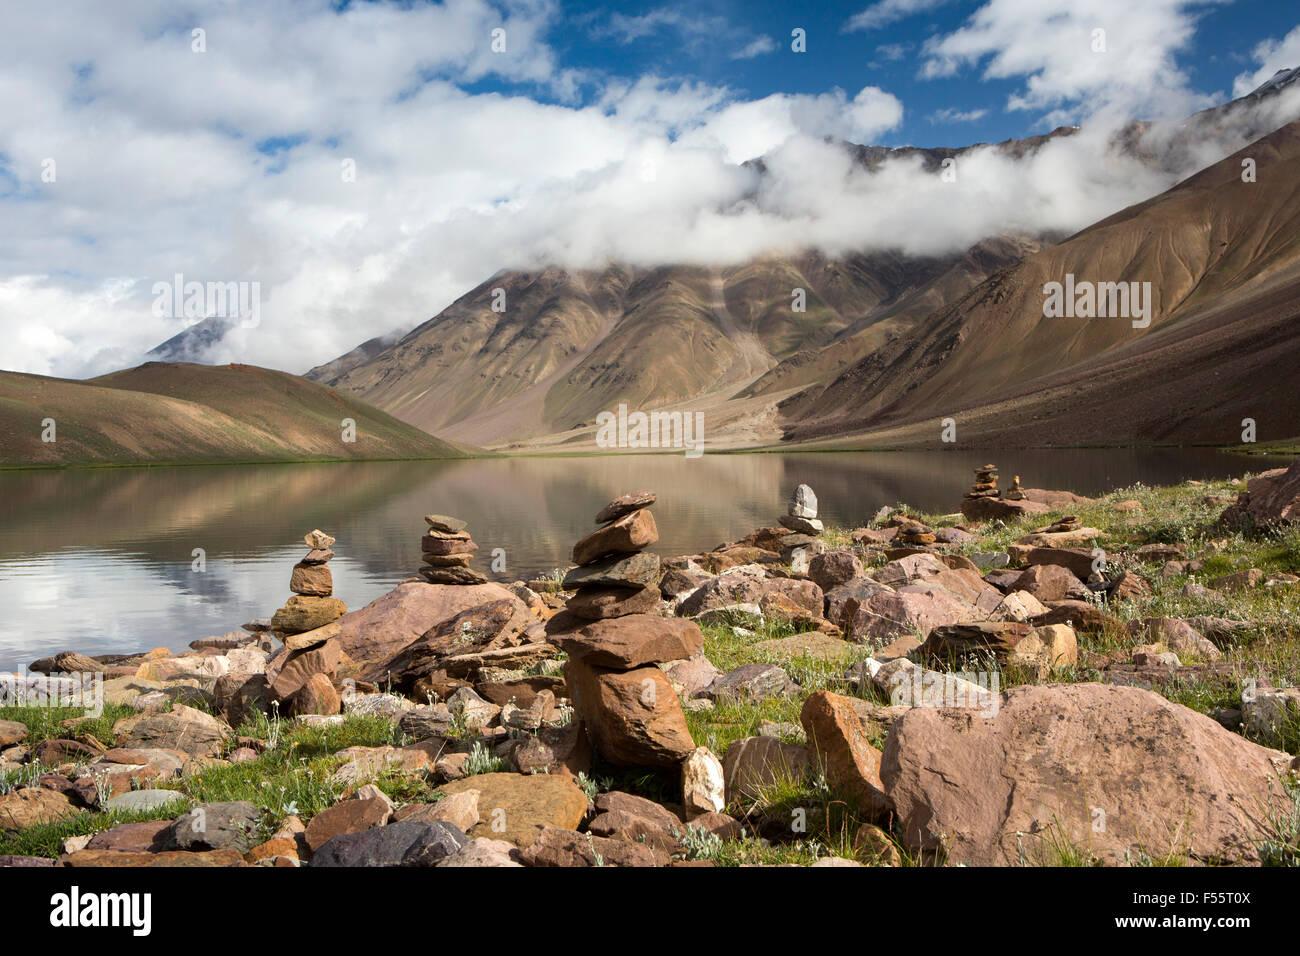 India, Himachal Pradesh, Spiti, Chandra Taal, Full Moon Lake, early morning, stone cairns on lake shore - Stock Image